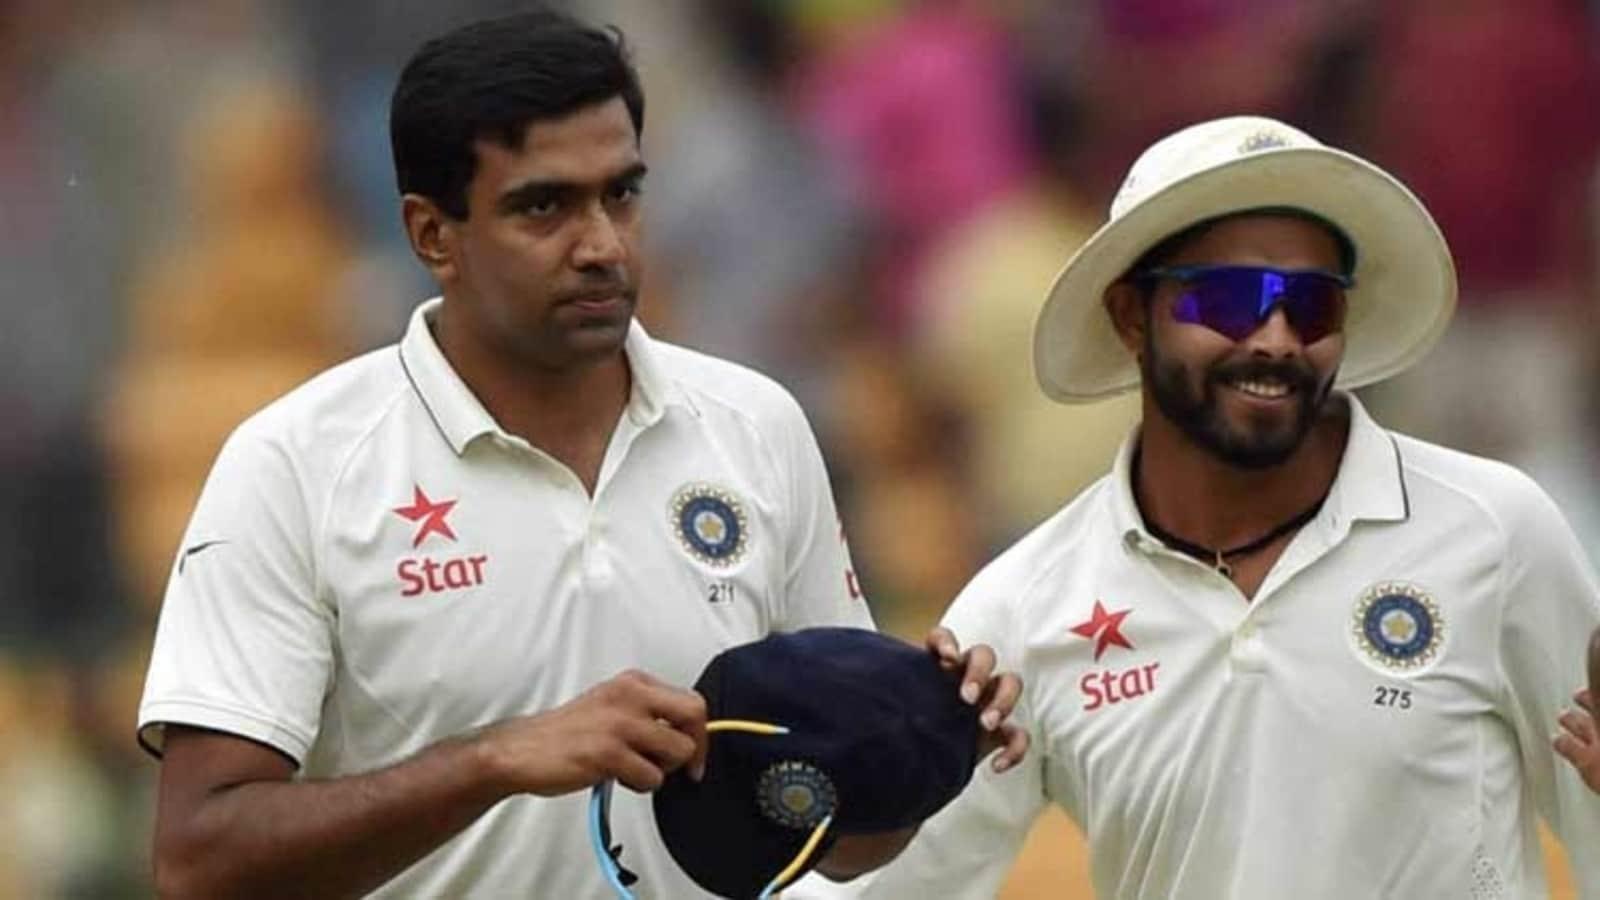 Kohli, Shastri must tell Ashwin, Jadeja they can get wickets': Maninder  Singh picks India's bowlers for WTC final   Cricket - Hindustan Times